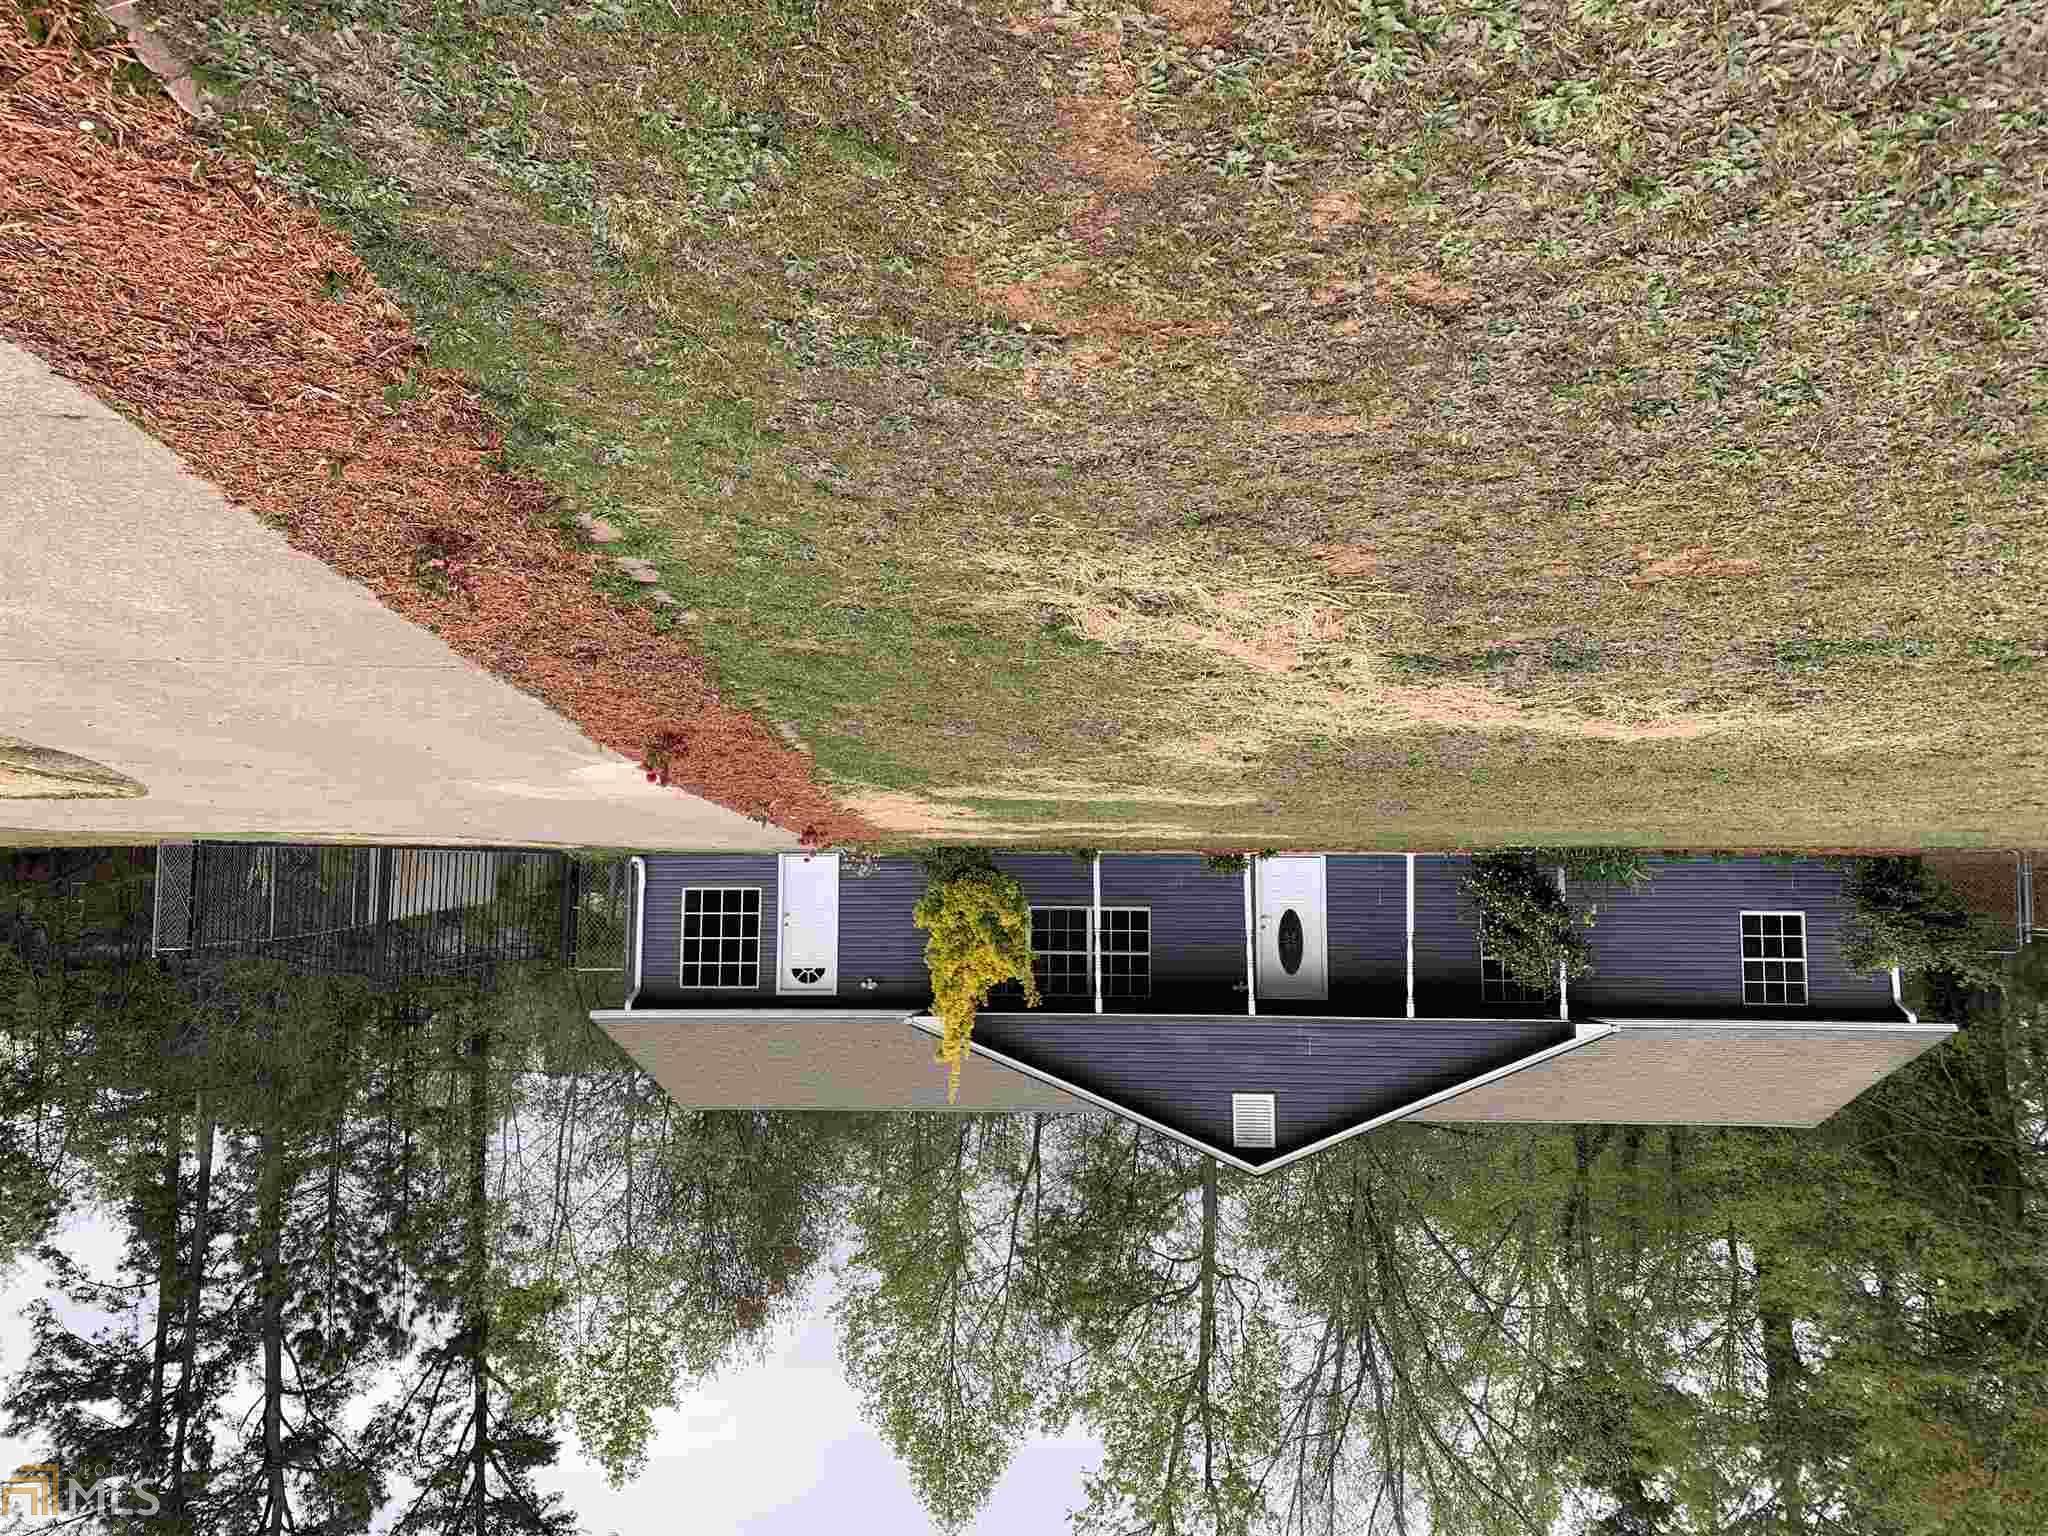 5322 Browns Bridge Rd, Gainesville, Georgia 30504, 3 Bedrooms Bedrooms, ,2 BathroomsBathrooms,Single Family,For Sale,5322 Browns Bridge Rd,1,8957414